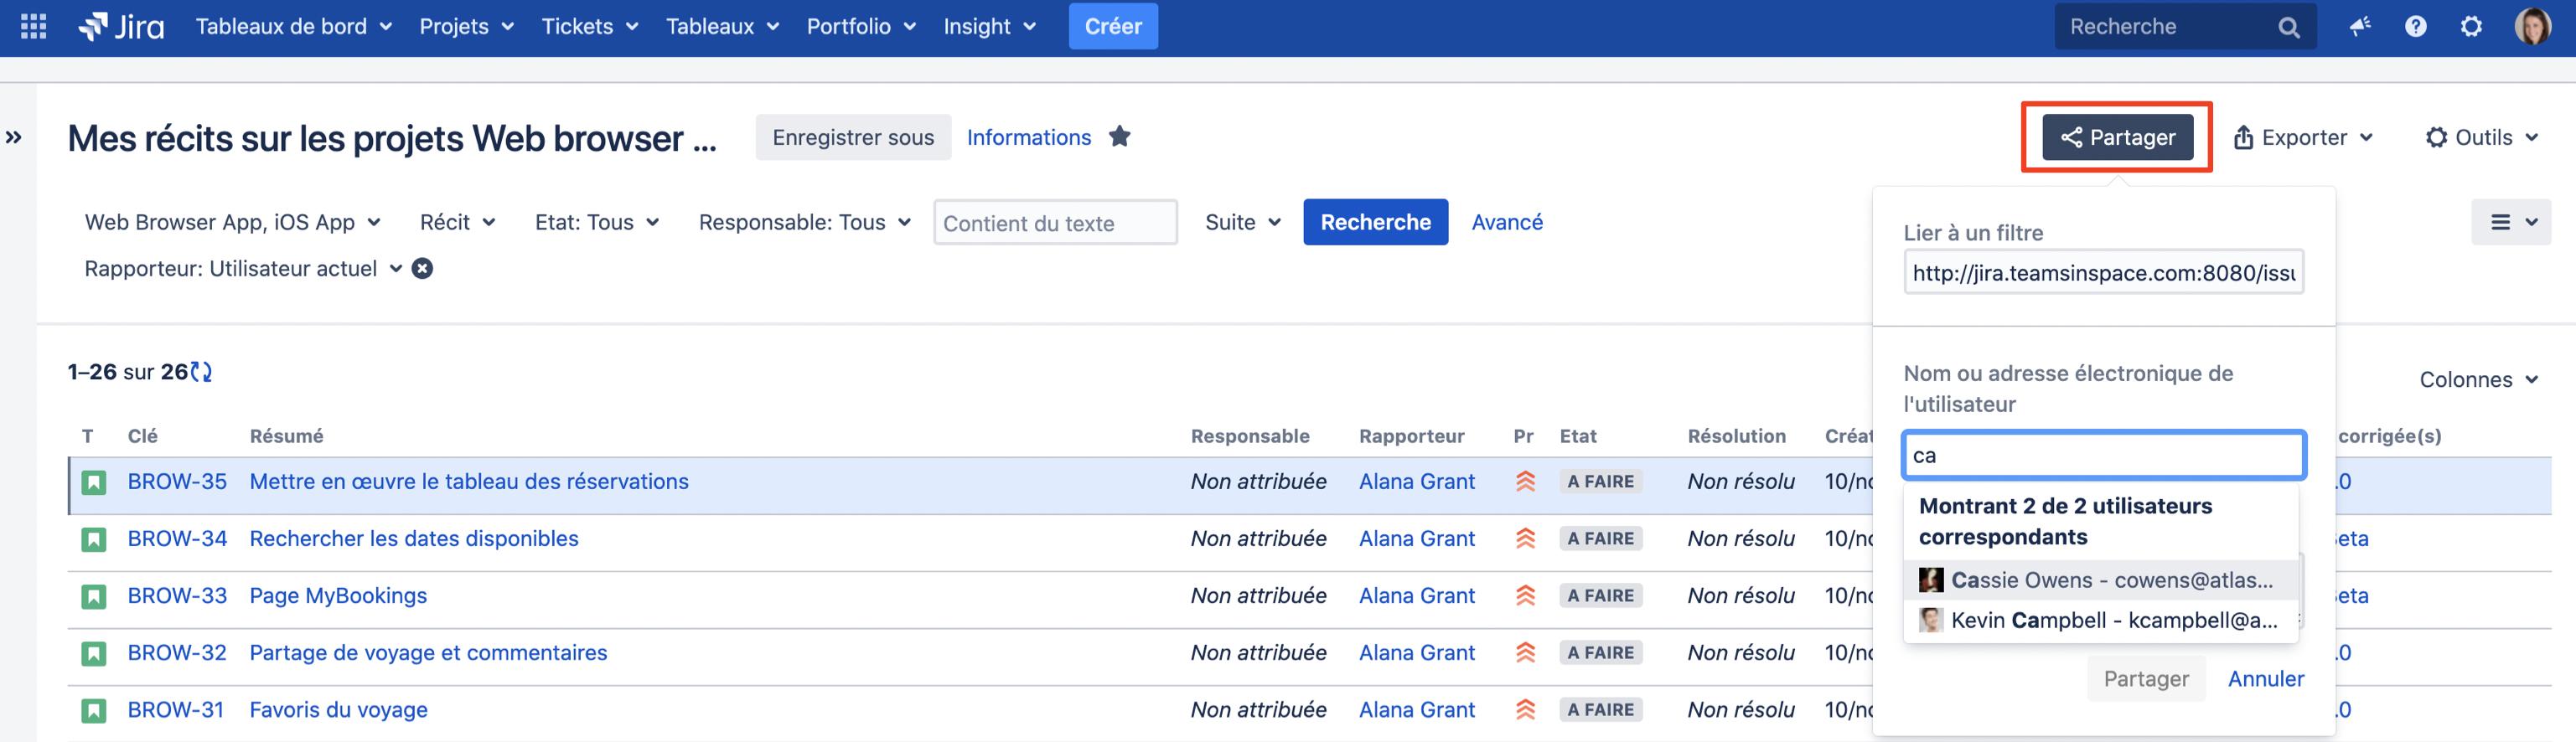 Exporter sa recherche Jira : envoyer les résultats de la recherche par mail